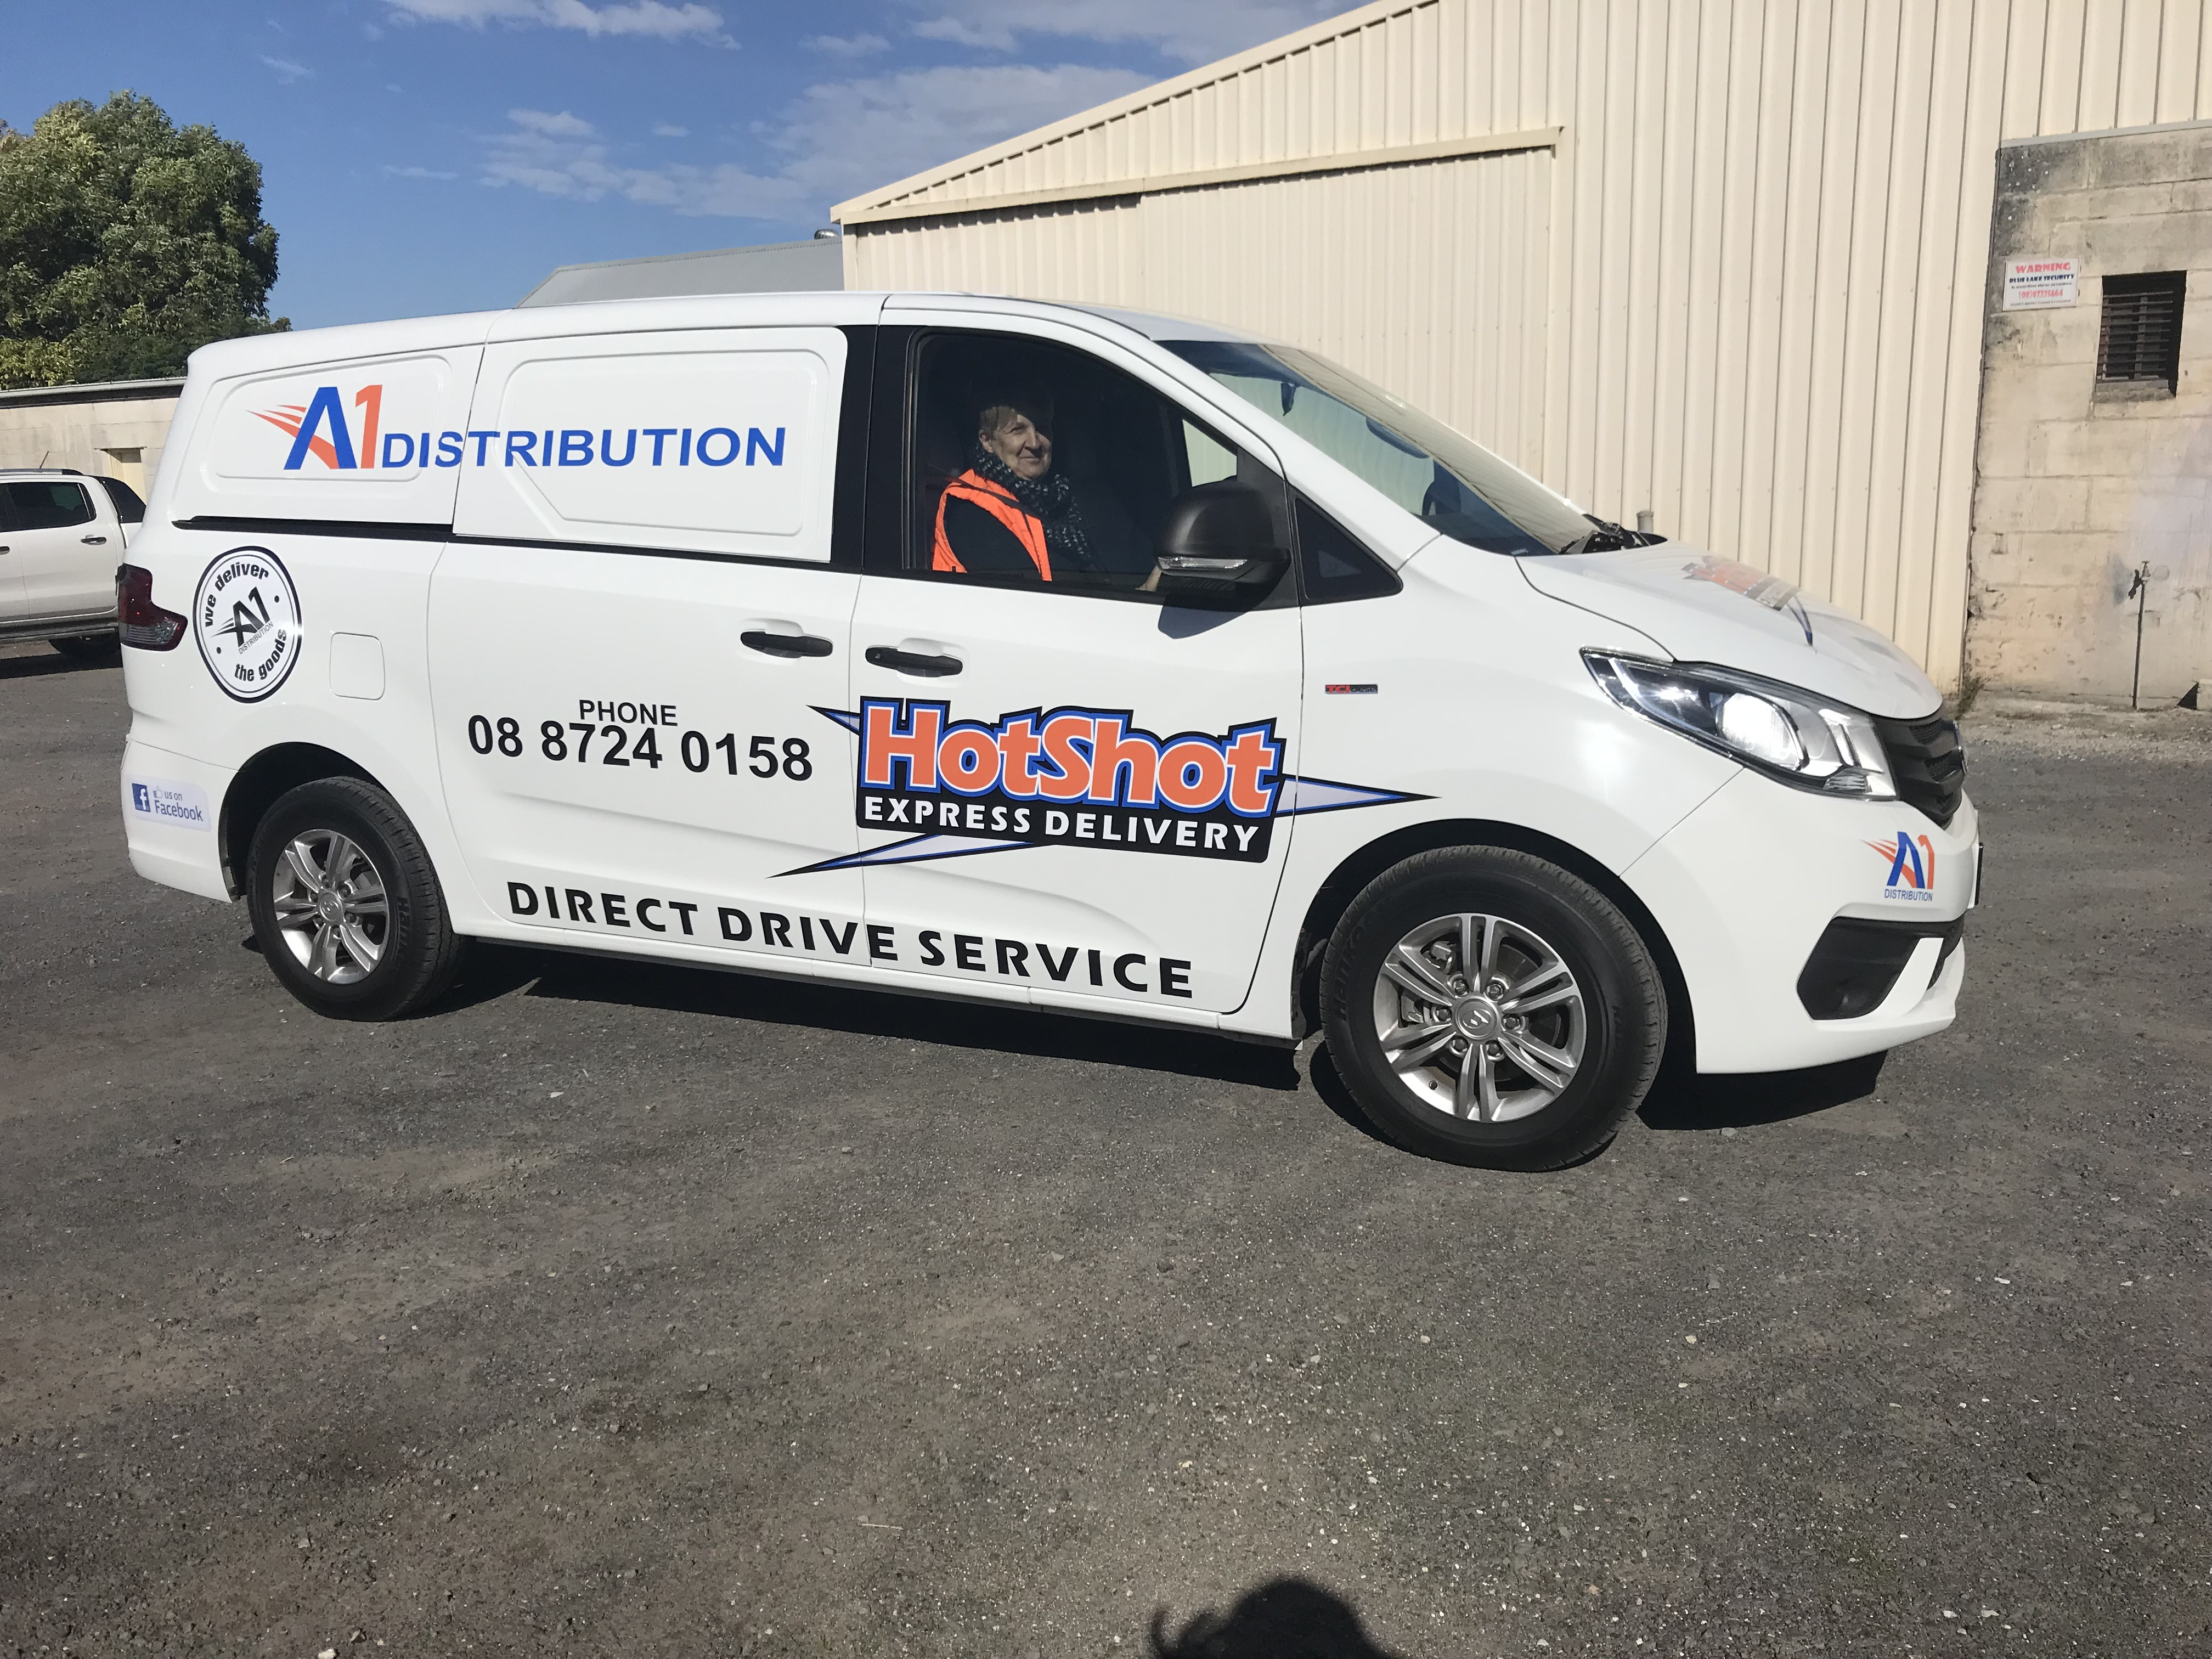 A1 Distribution Van Signage